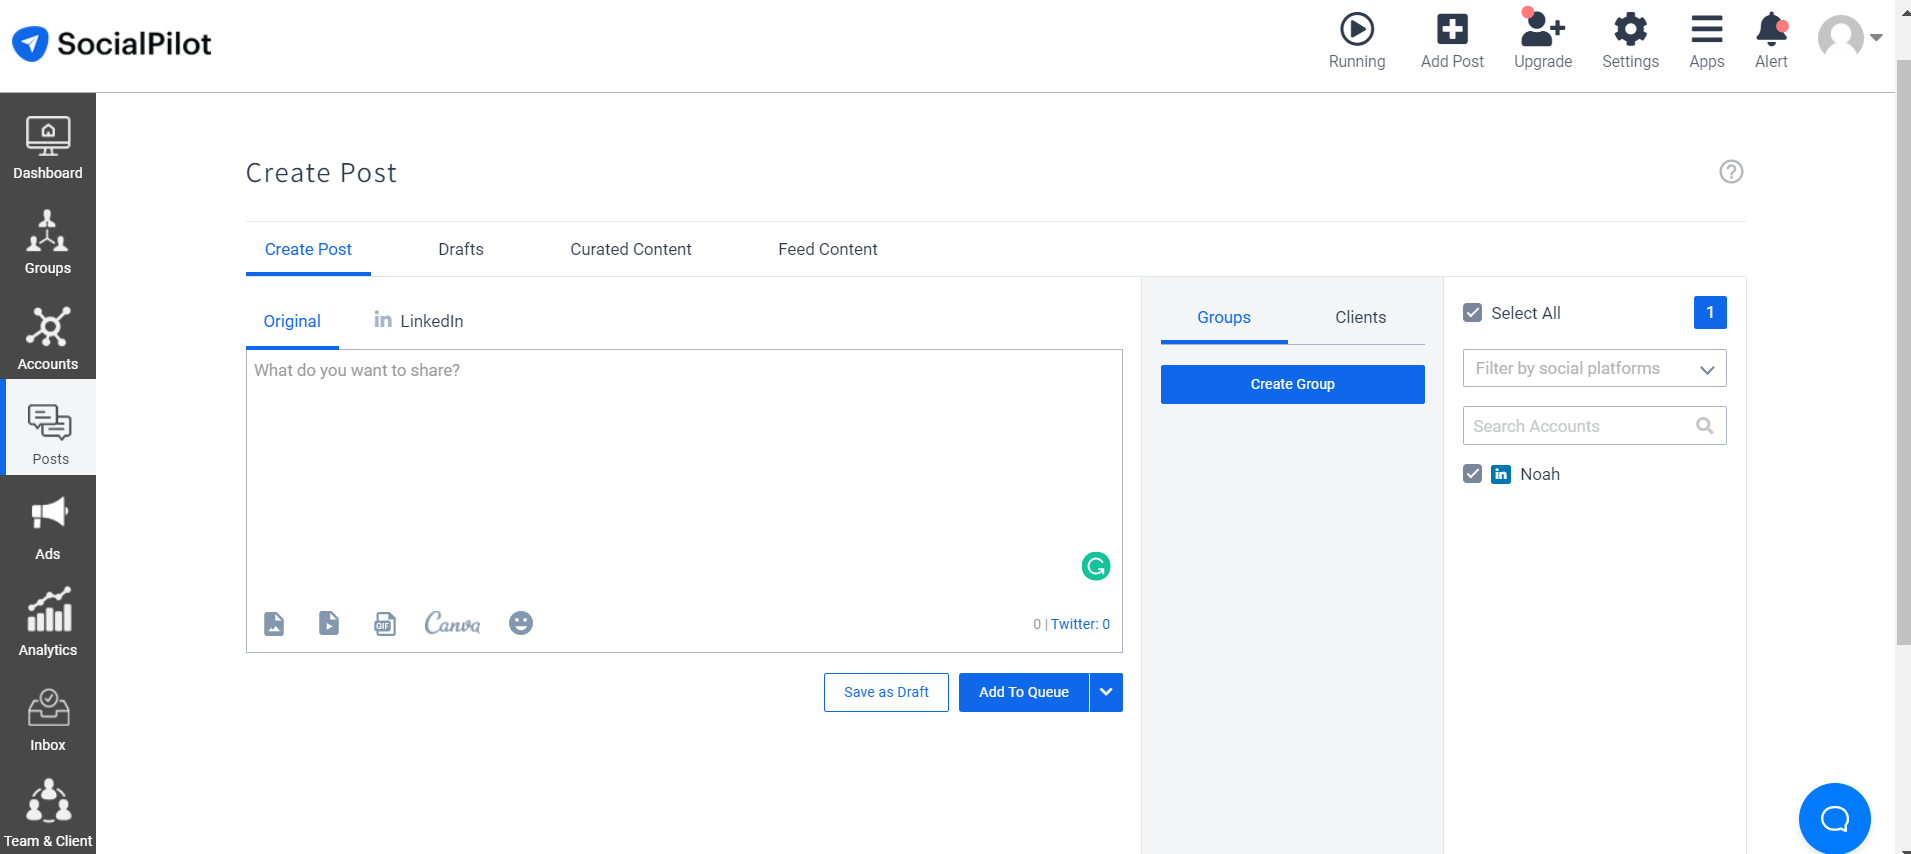 Create Group on SocialPilot